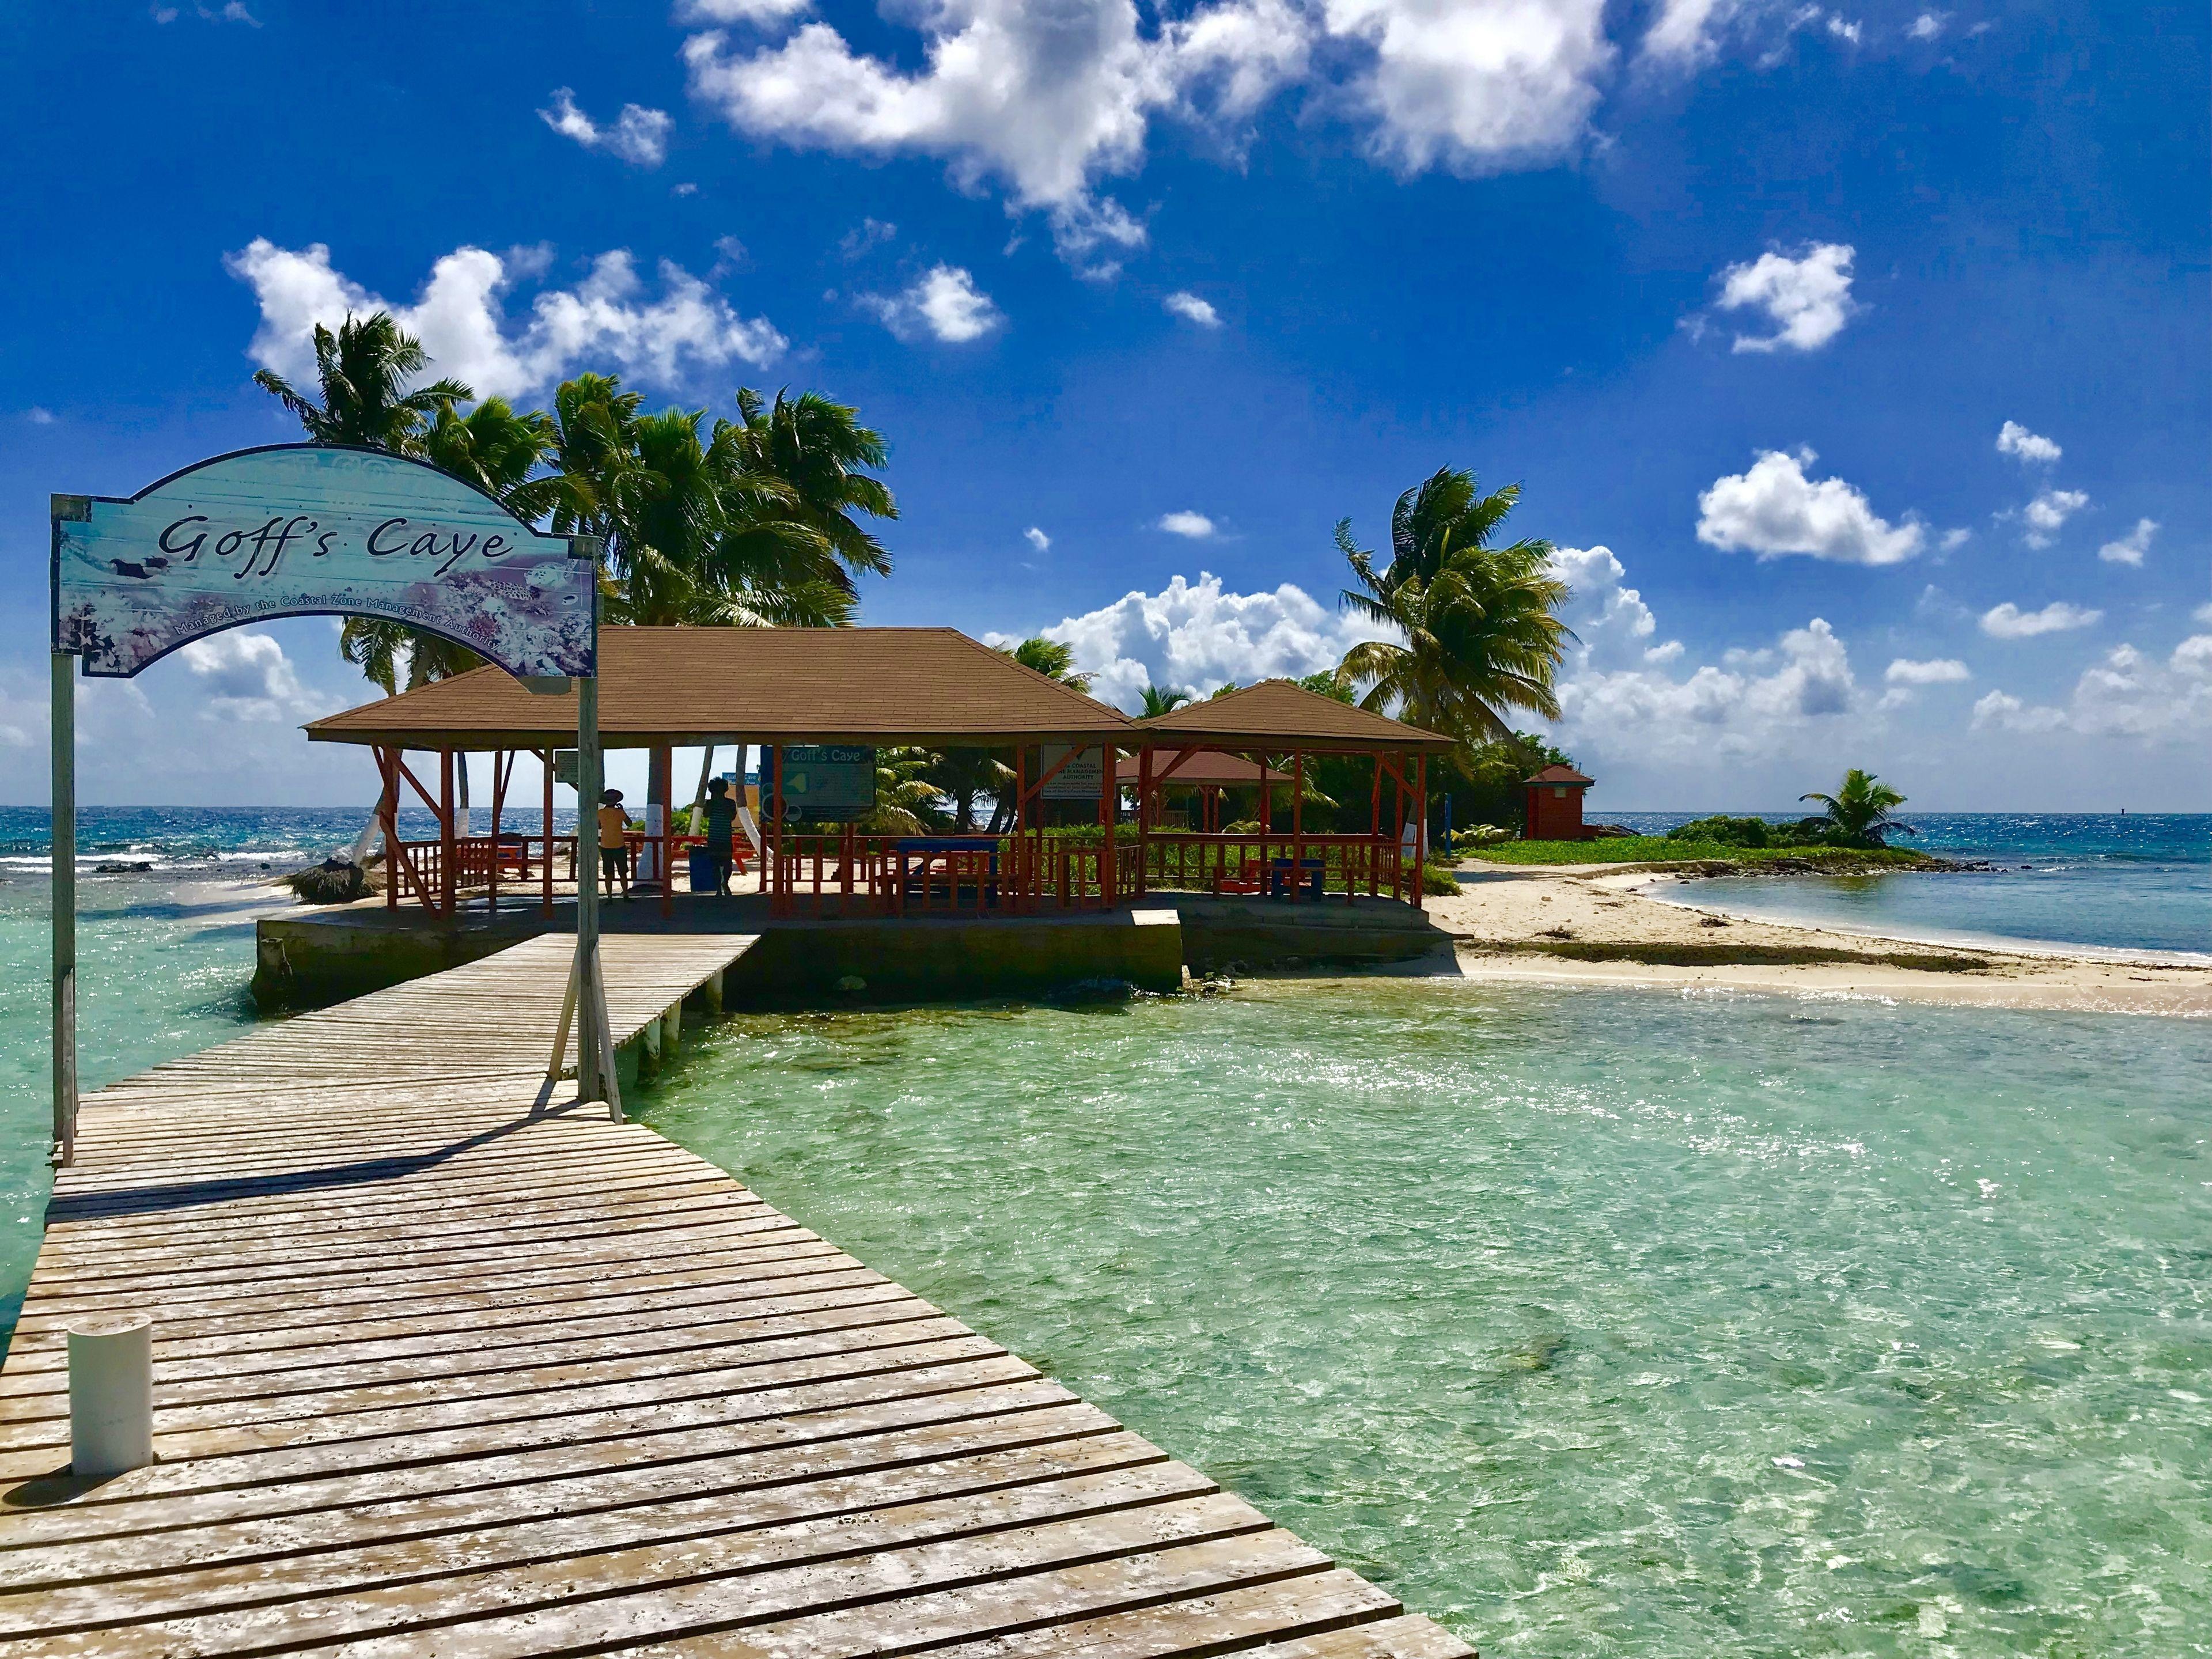 Goff's Caye Island Beach Break And Snorkeling